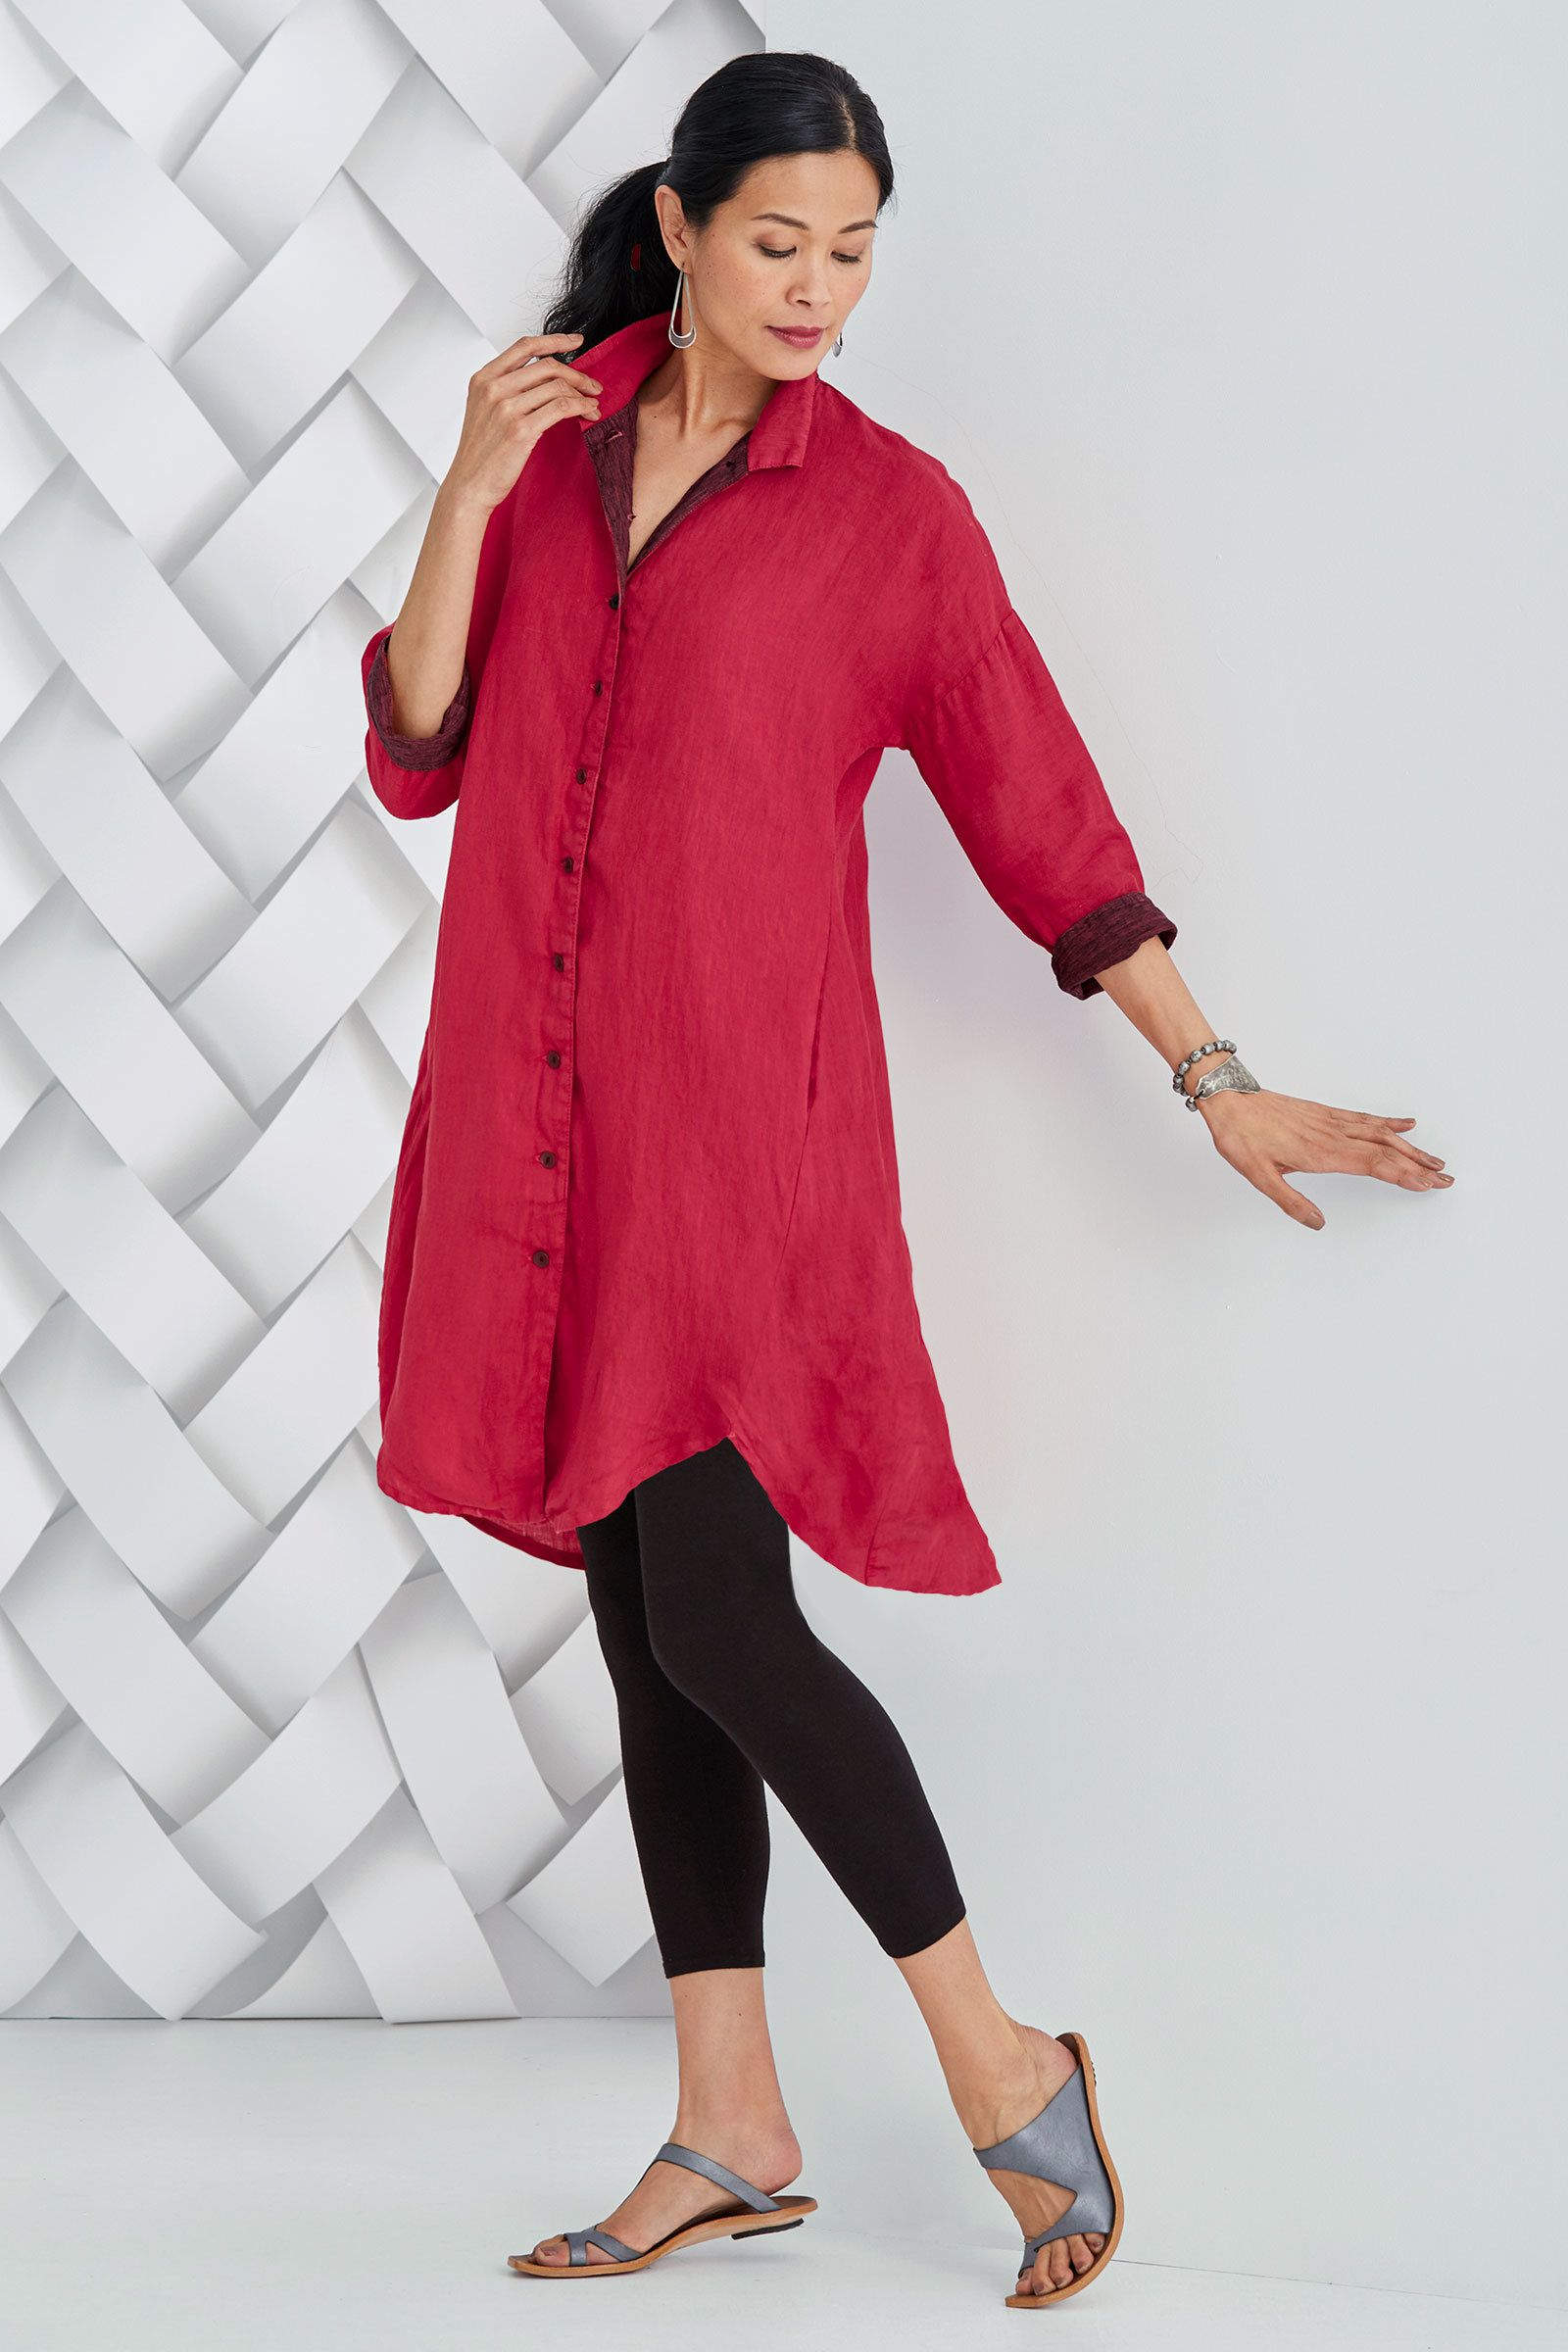 Positano Shirt Dress by Lisa Bayne   This fantastic shirtdress has